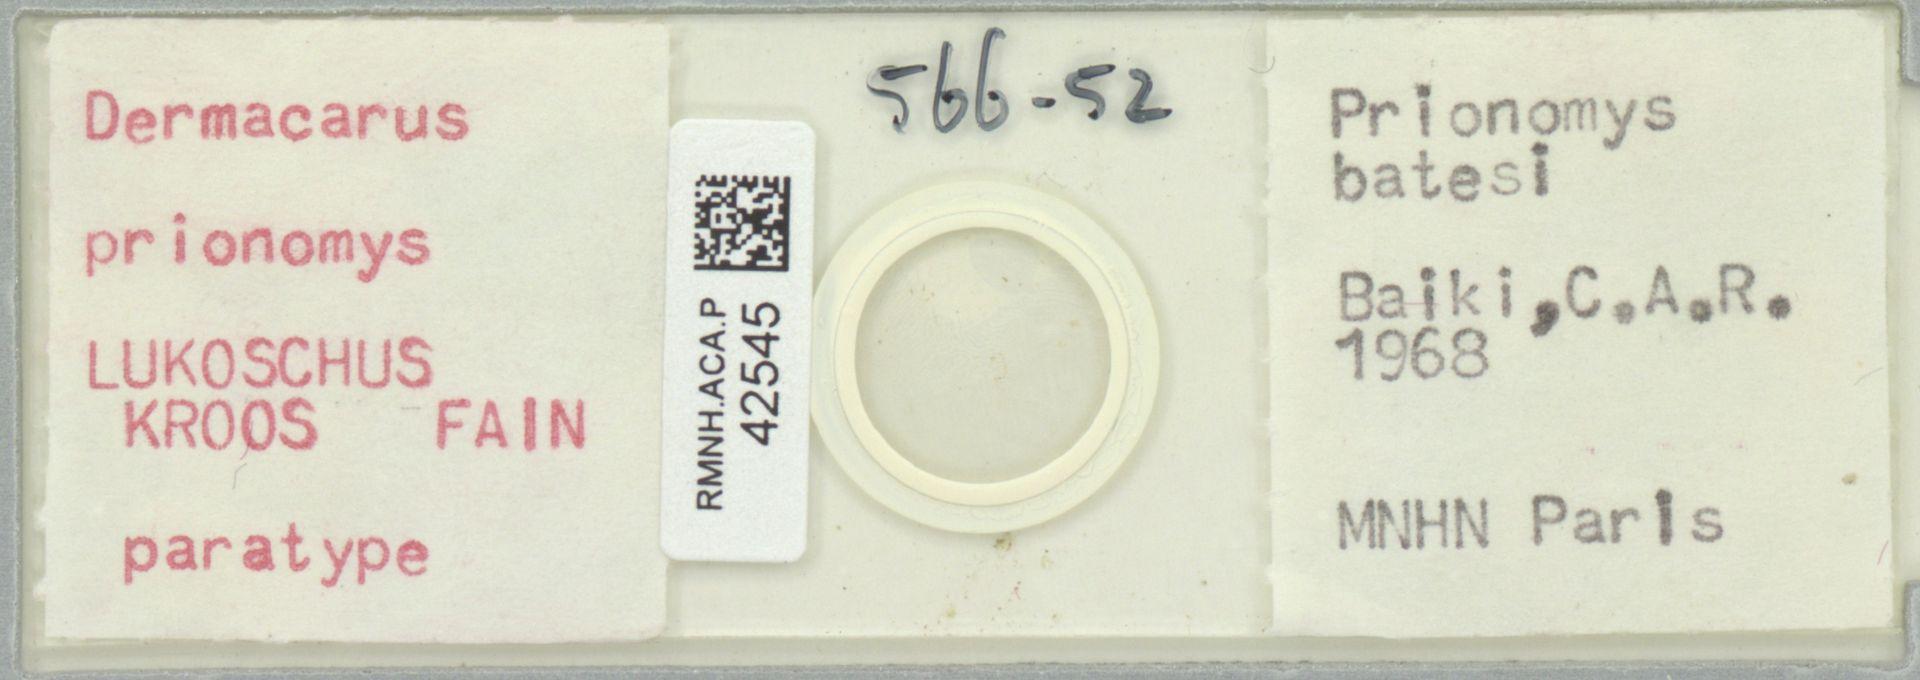 RMNH.ACA.P.42545 | Dermacarus prionomys Lukoschus, Kroos, Fain